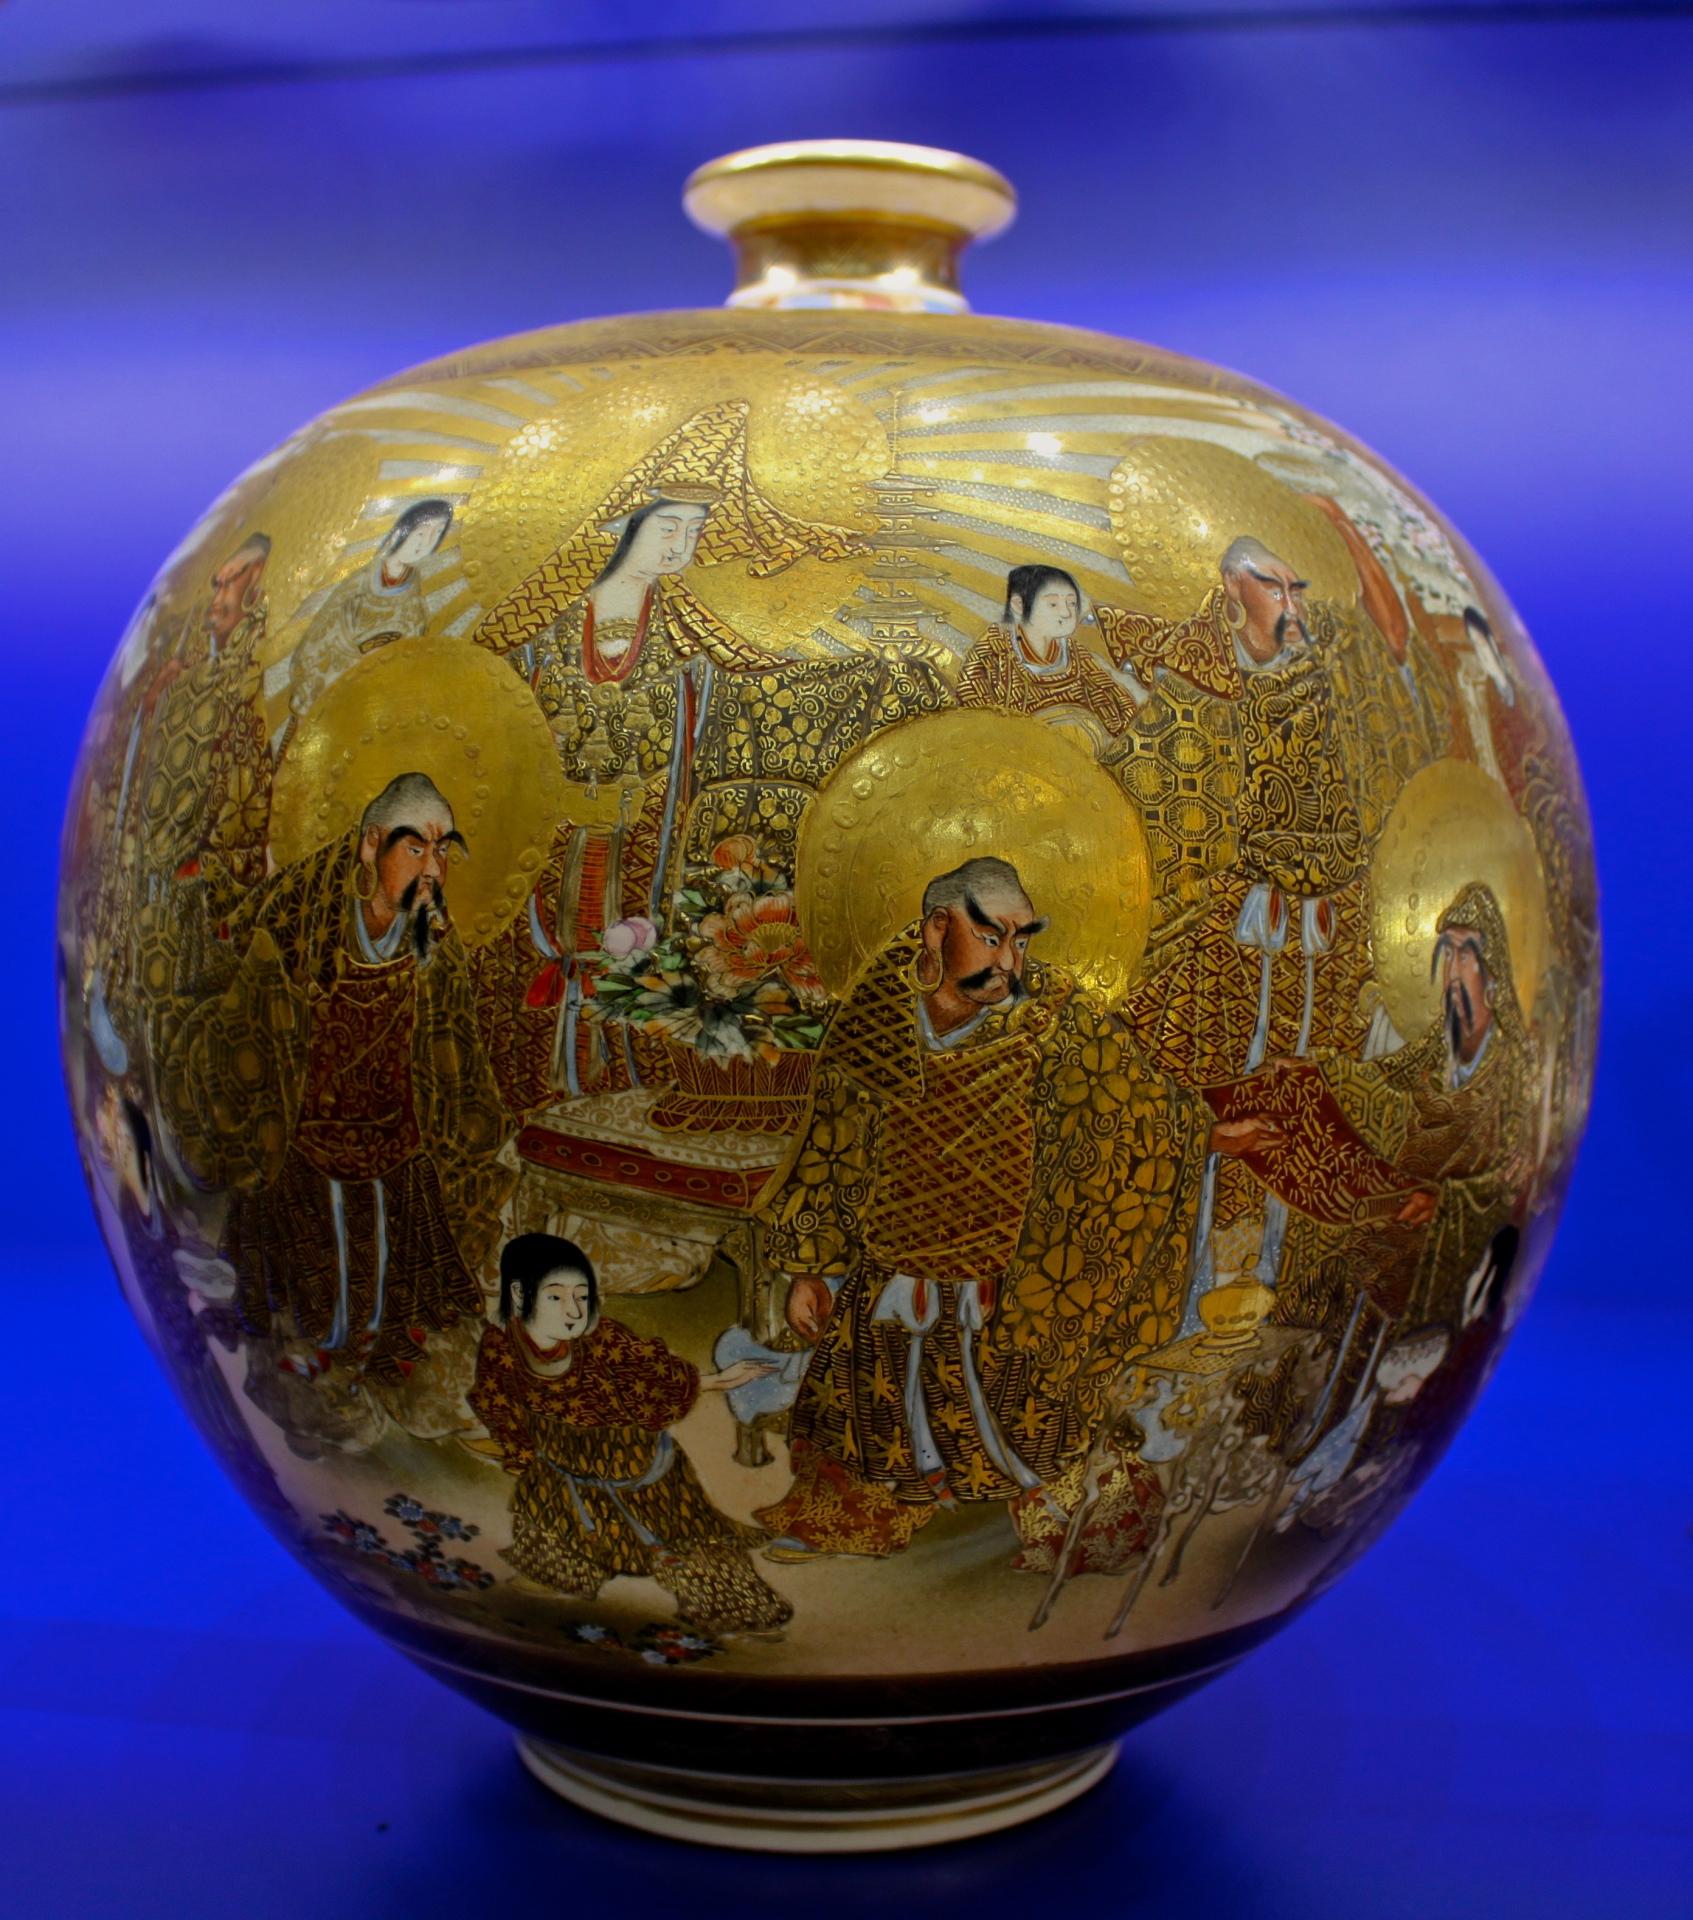 Stunning Satsuma Vase circe 1880